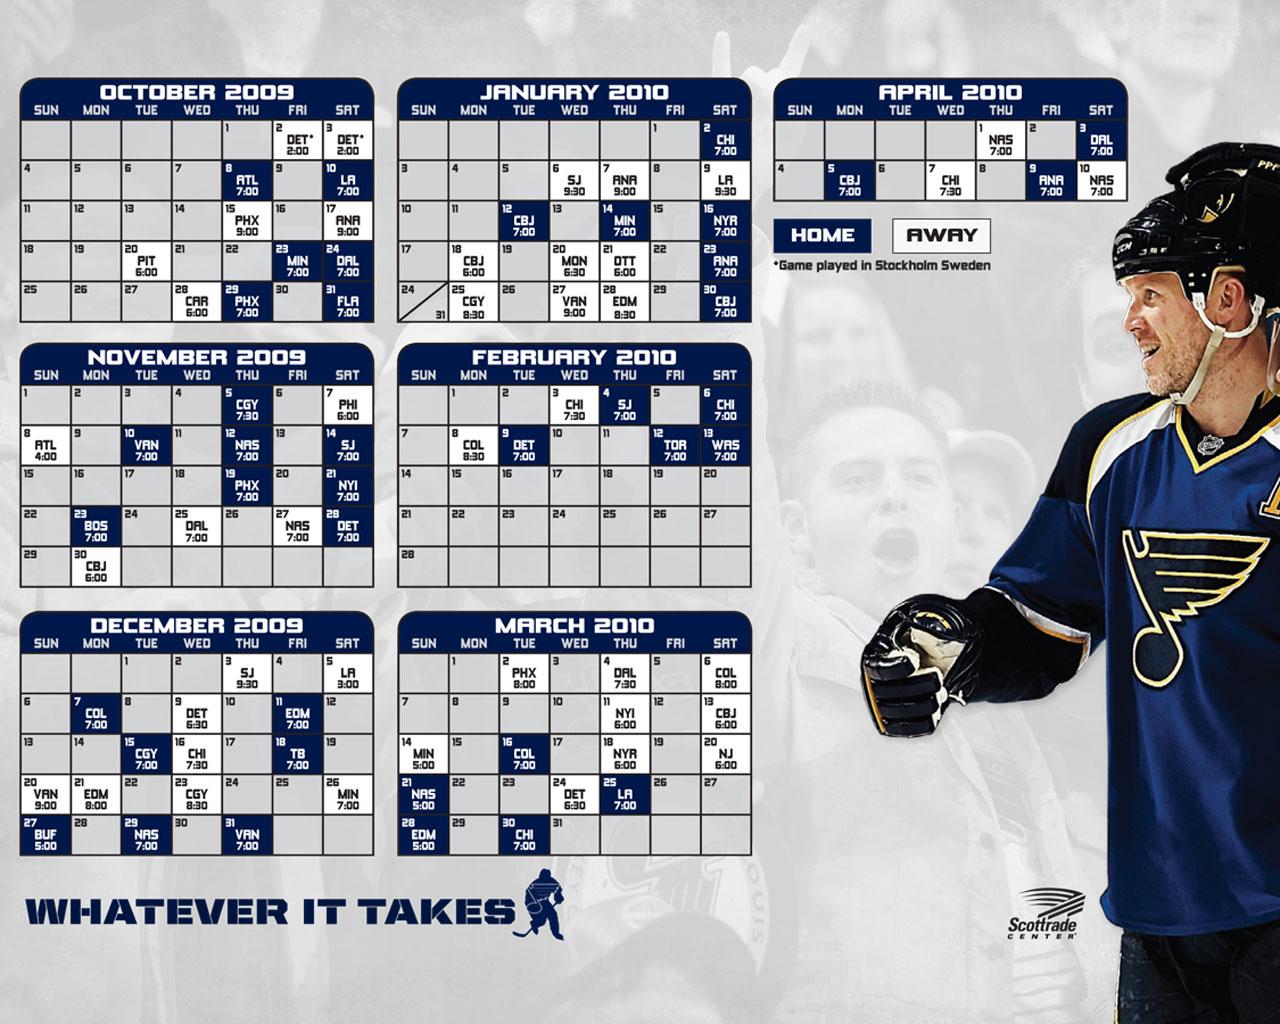 St Louis Blues Schedule Wallpaper WallpaperSafari